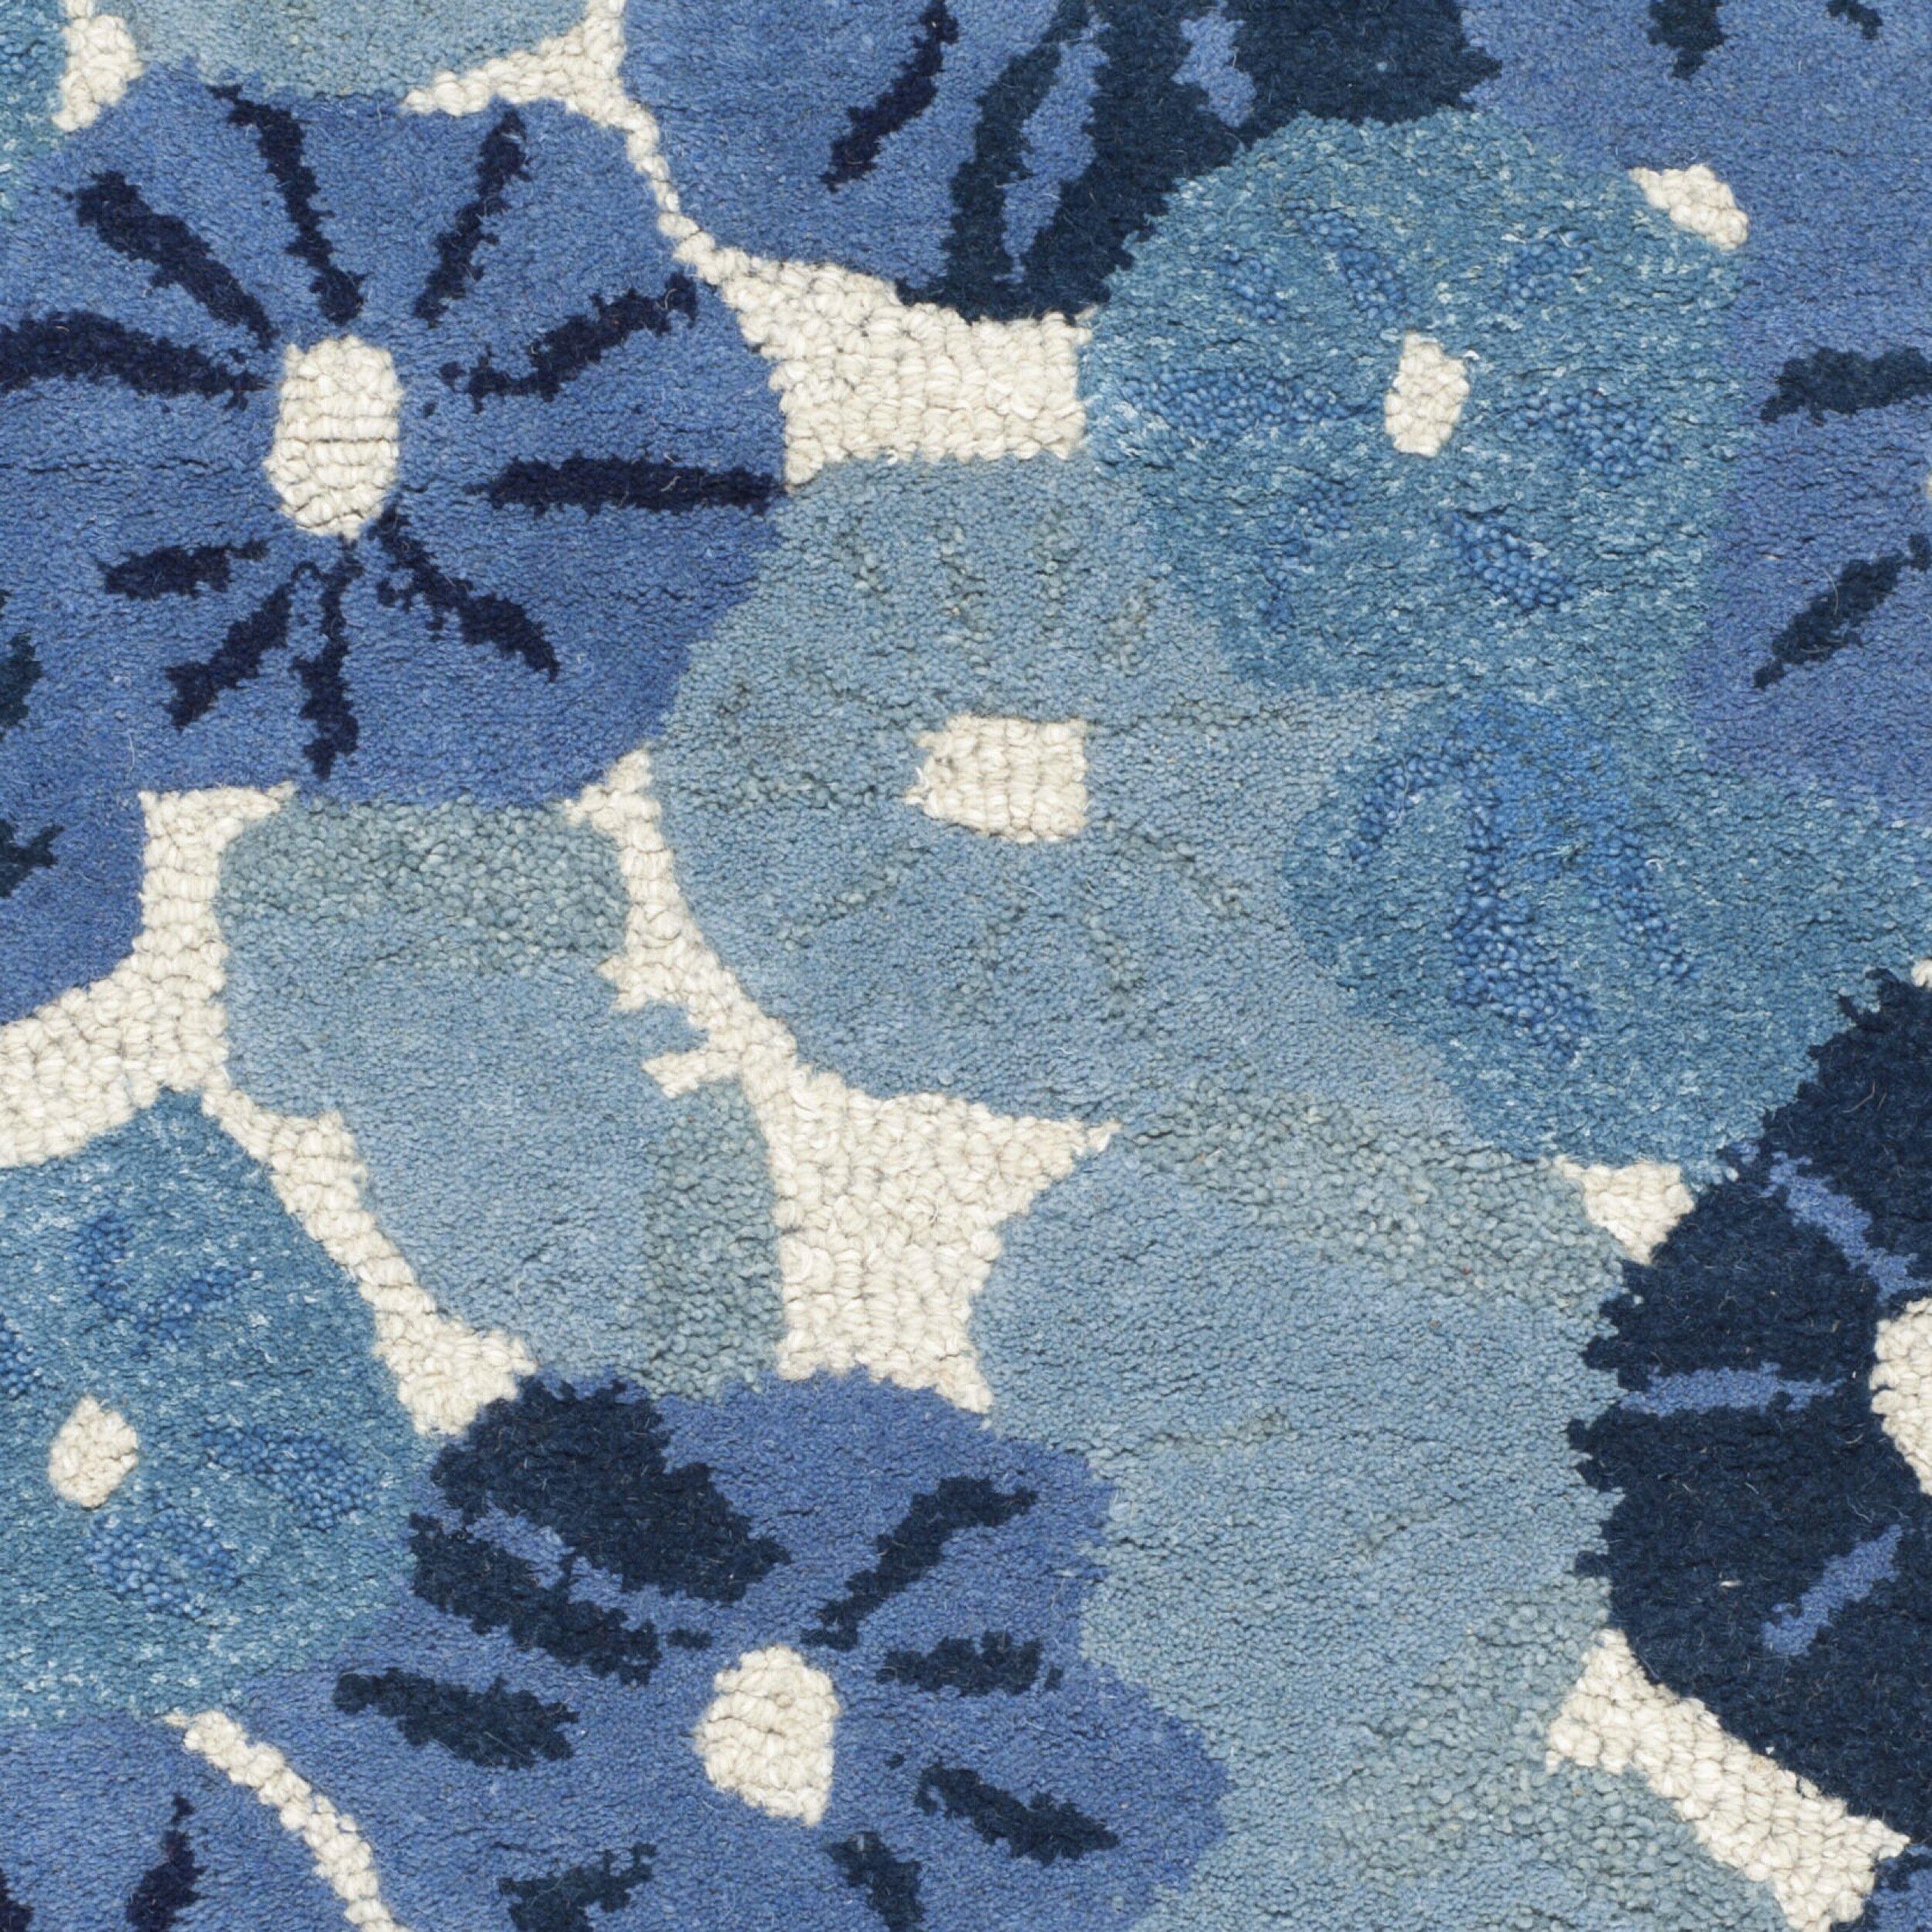 martha stewart rugs martha stewart azurite blue area rug - Martha Stewart Rugs